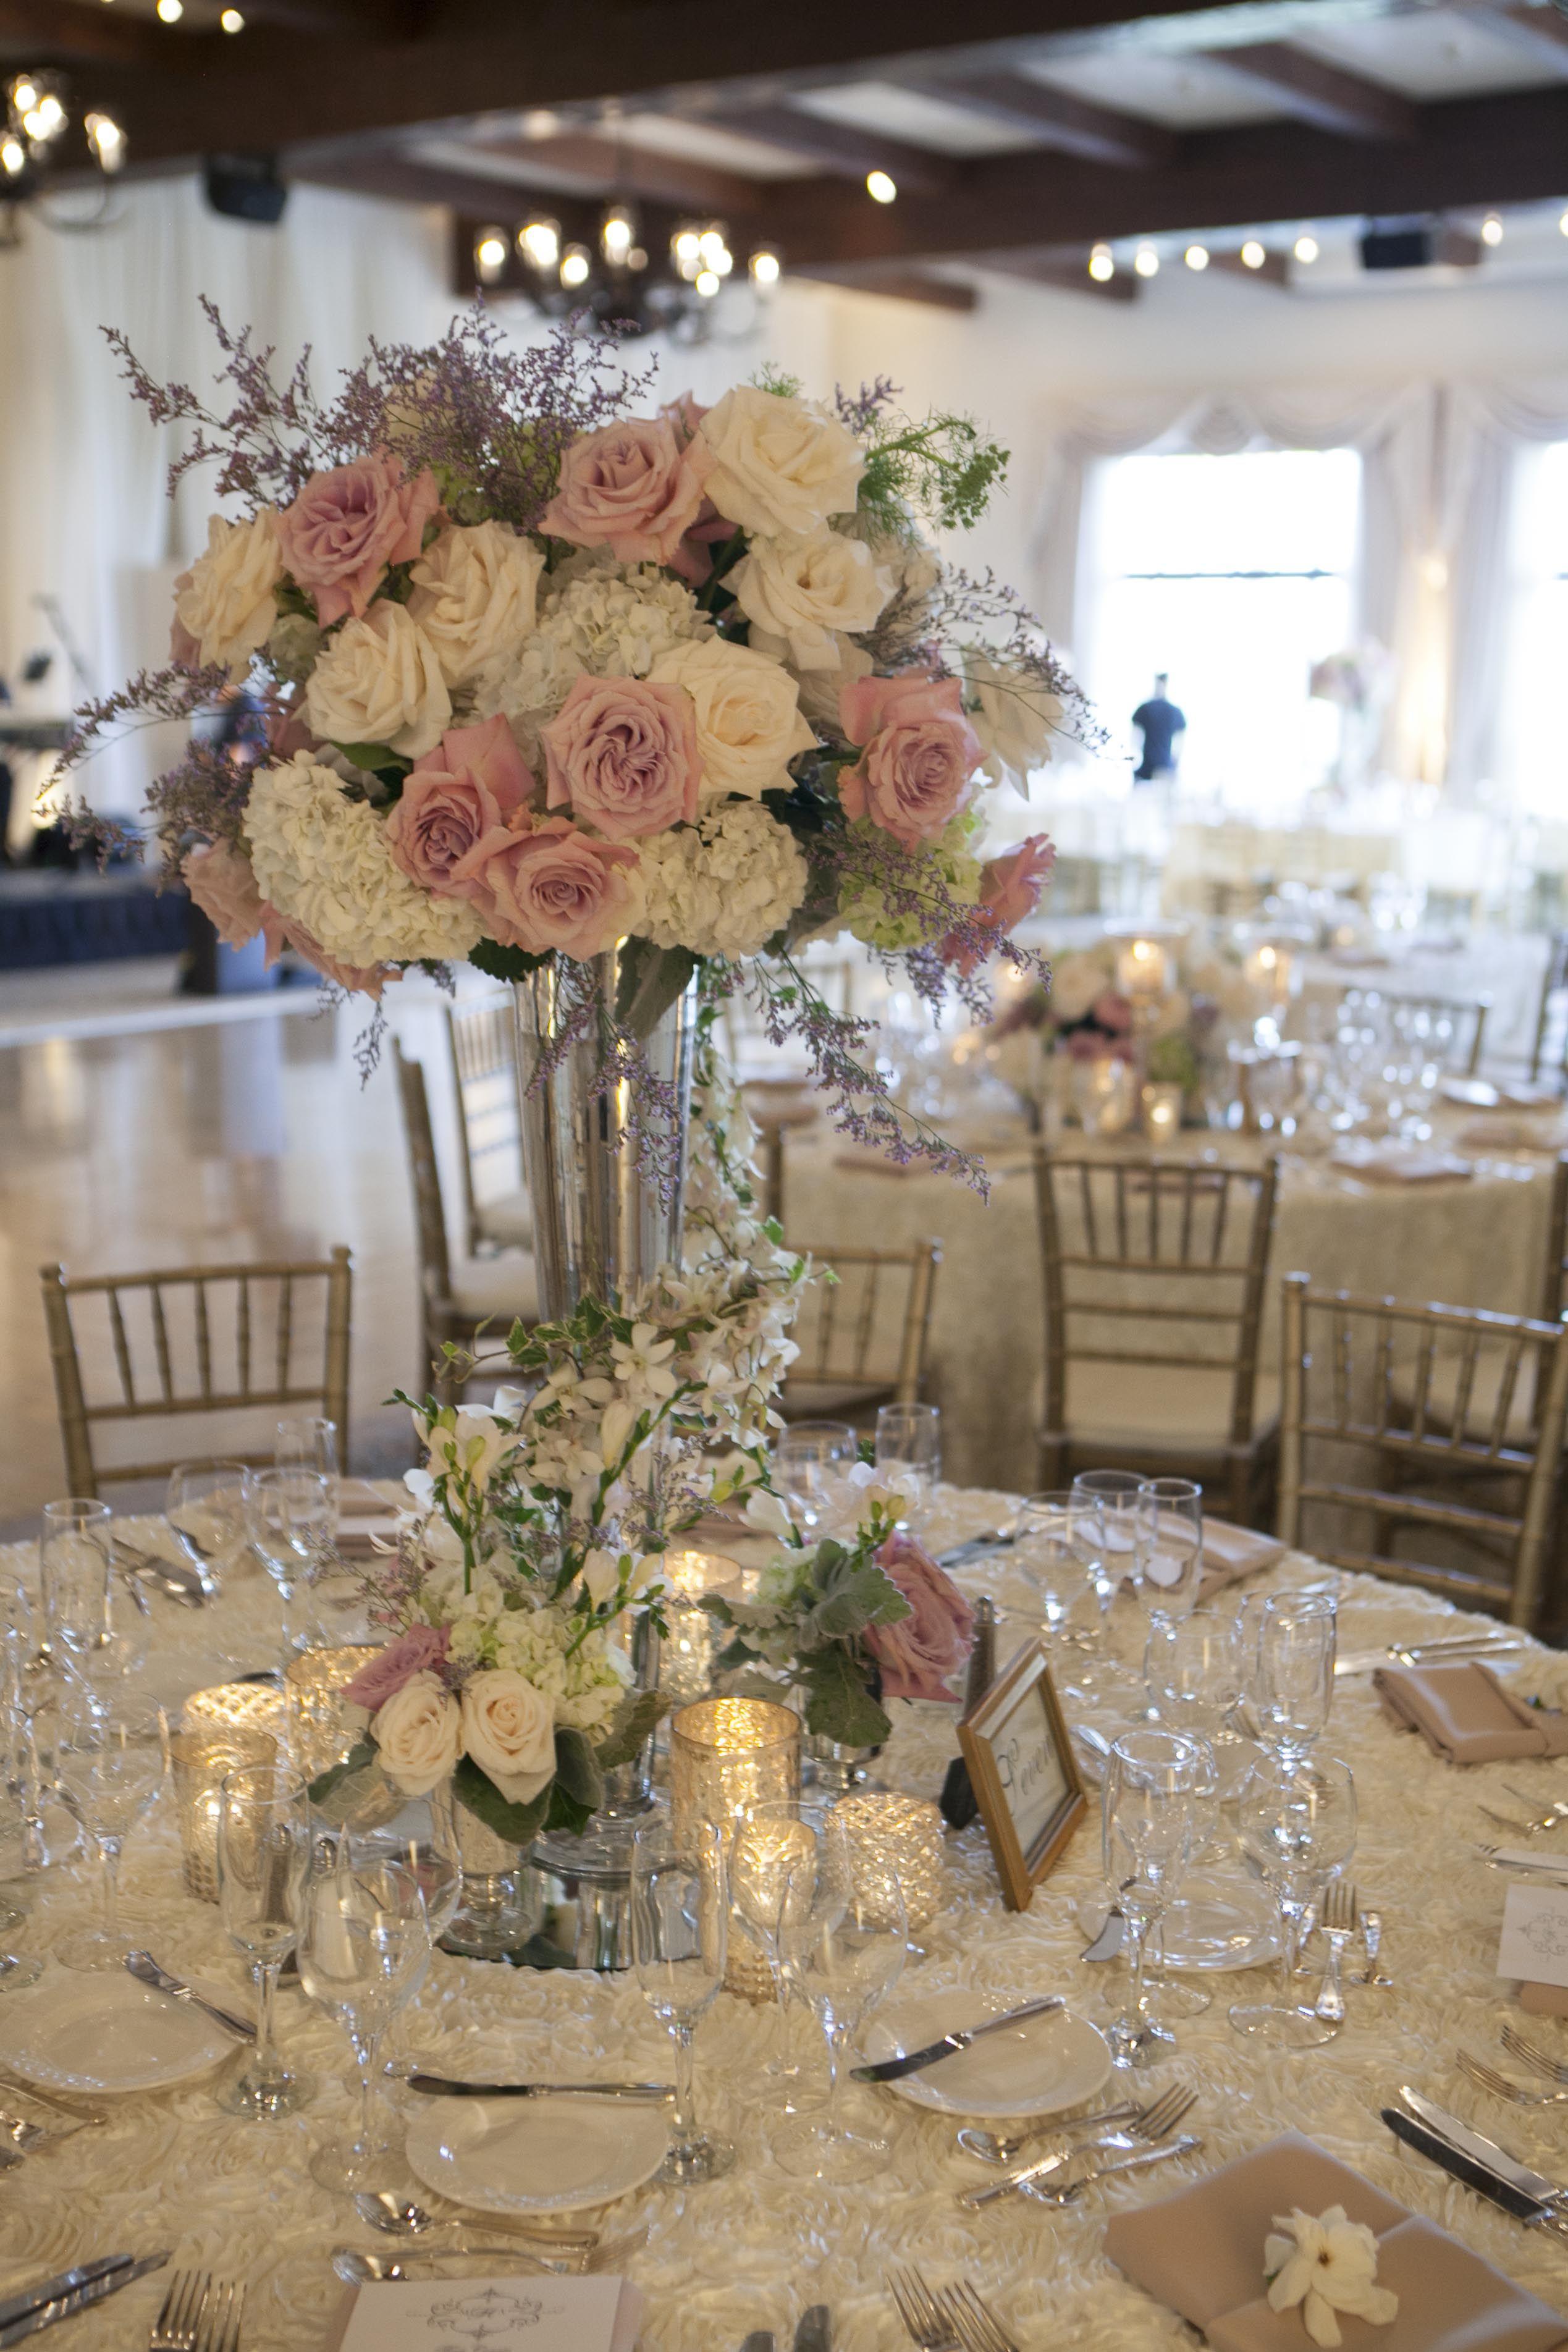 Wedding decoration ideas centerpieces  Super romantic  Wedding Ideas  Pinterest  Romantic Magazines and